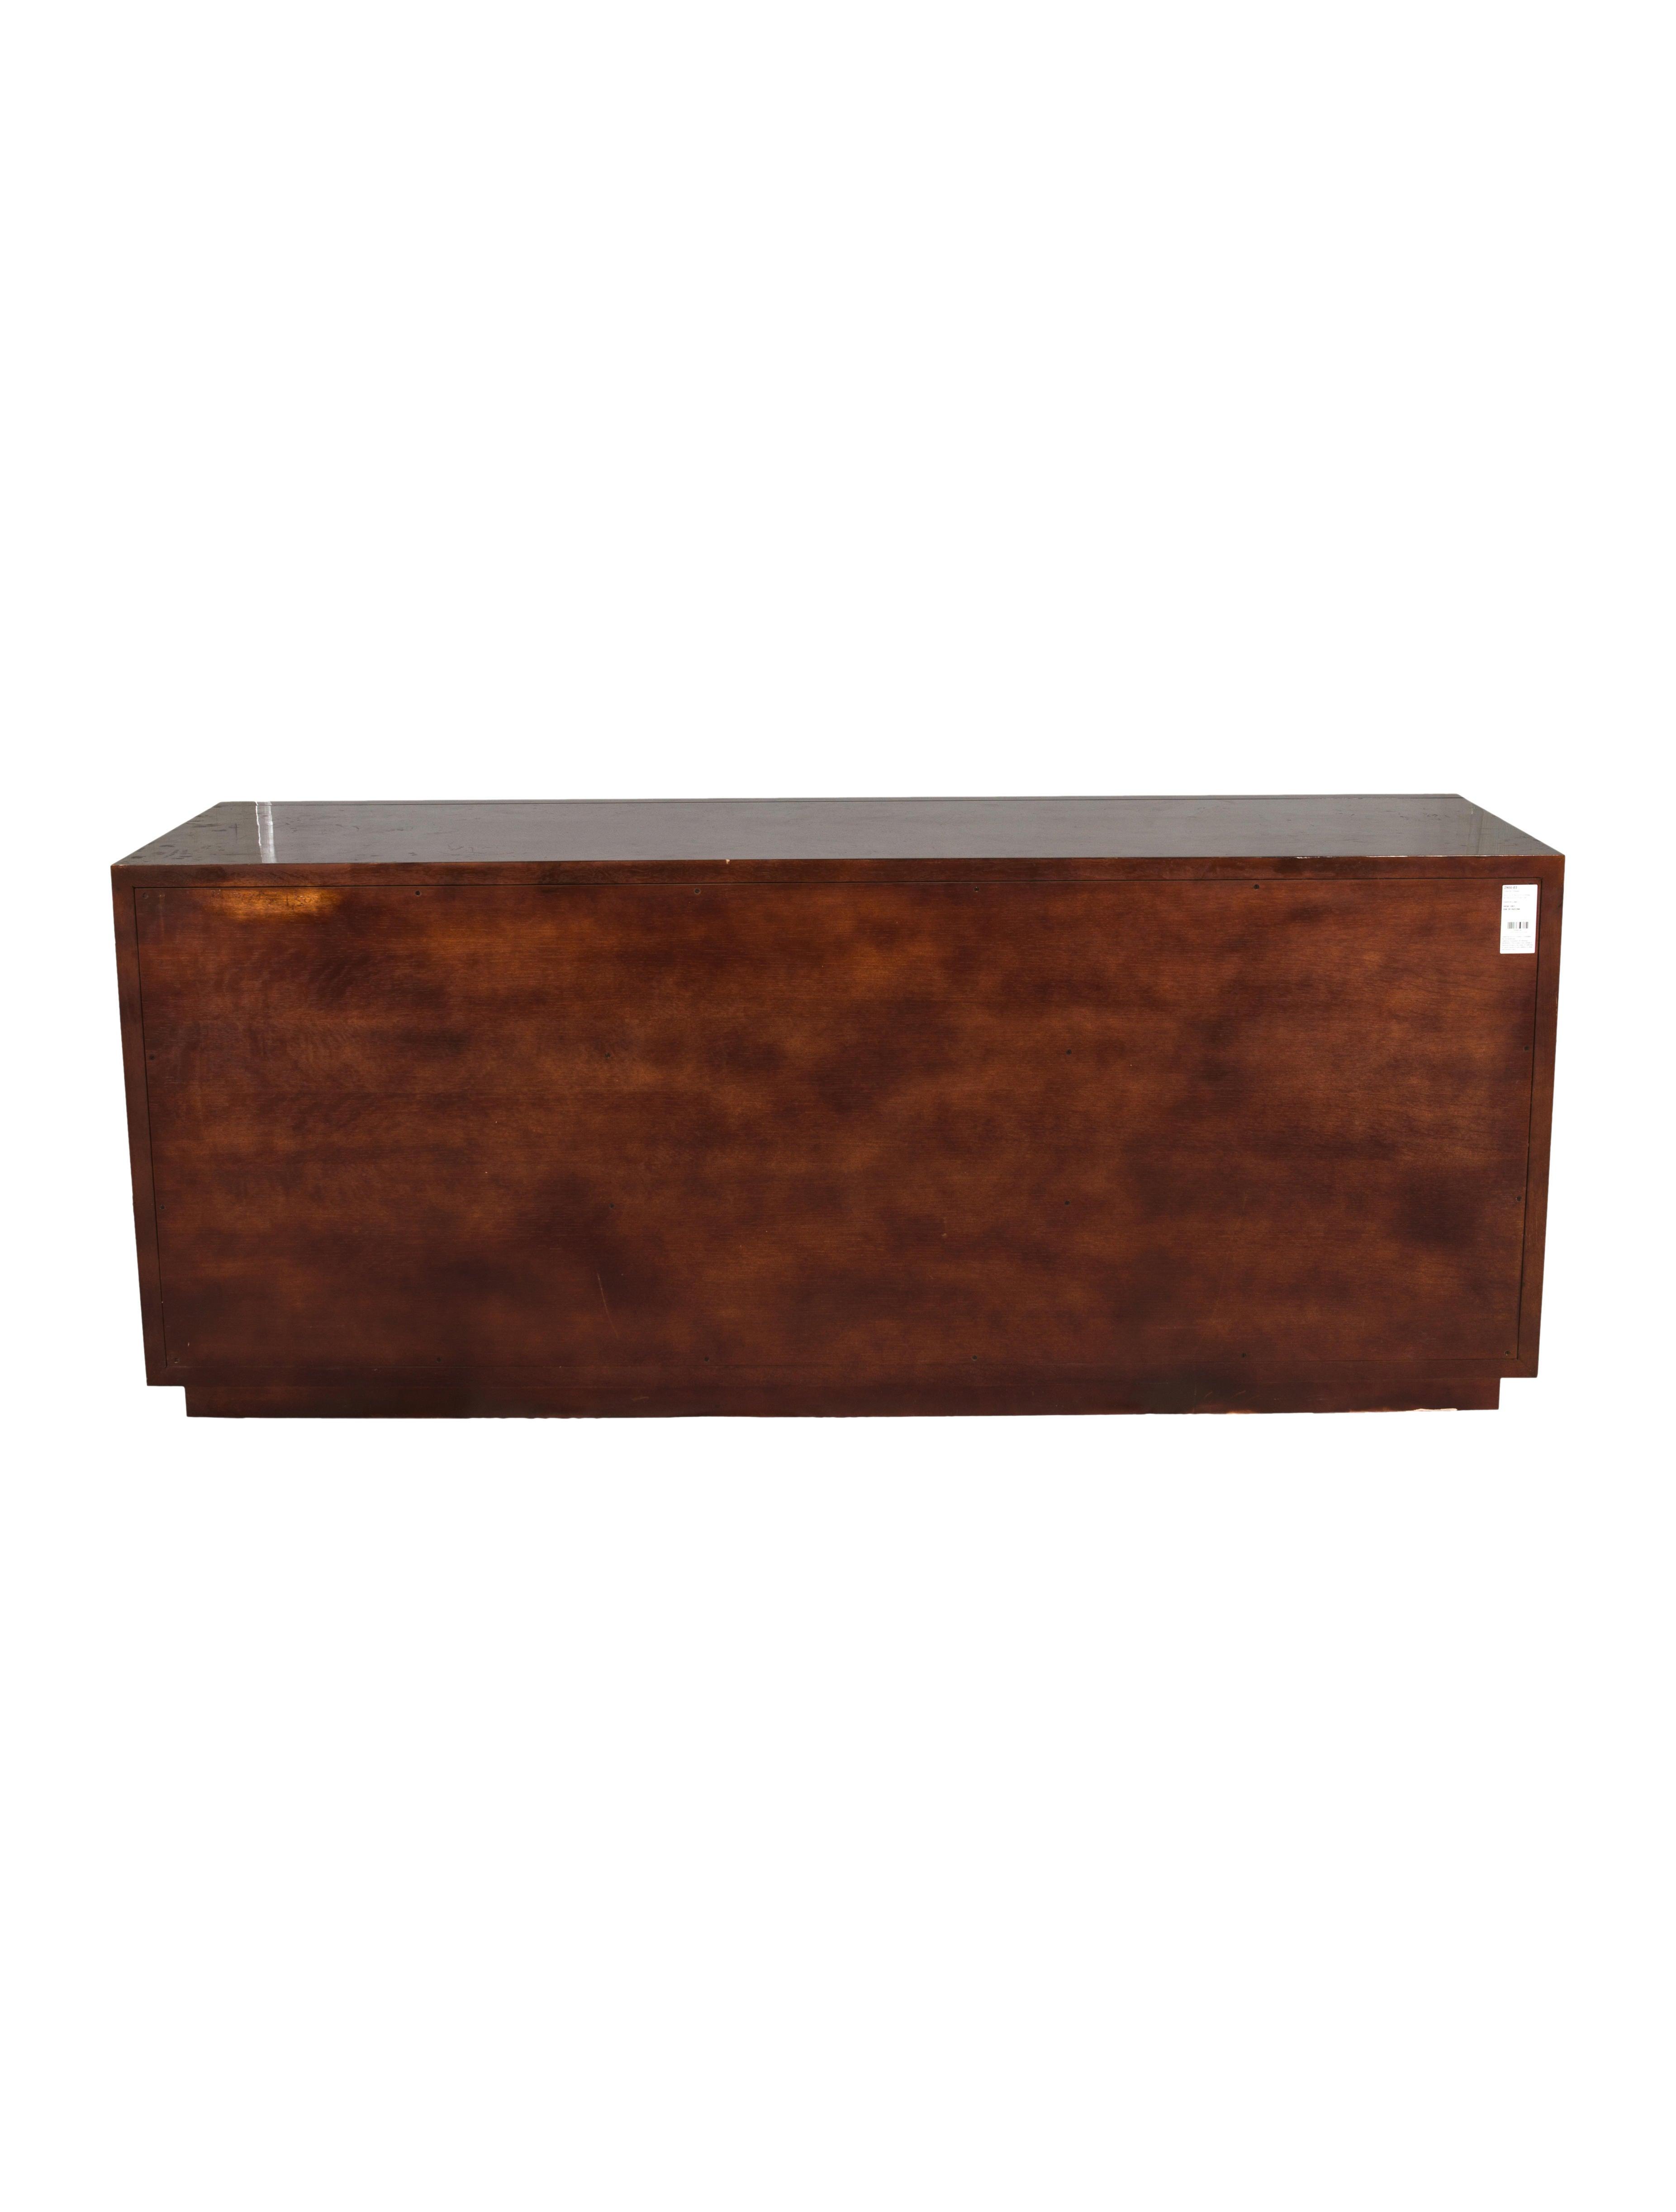 Ralph lauren cliff house dresser furniture wyg22171 for Ralph lauren outdoor furniture